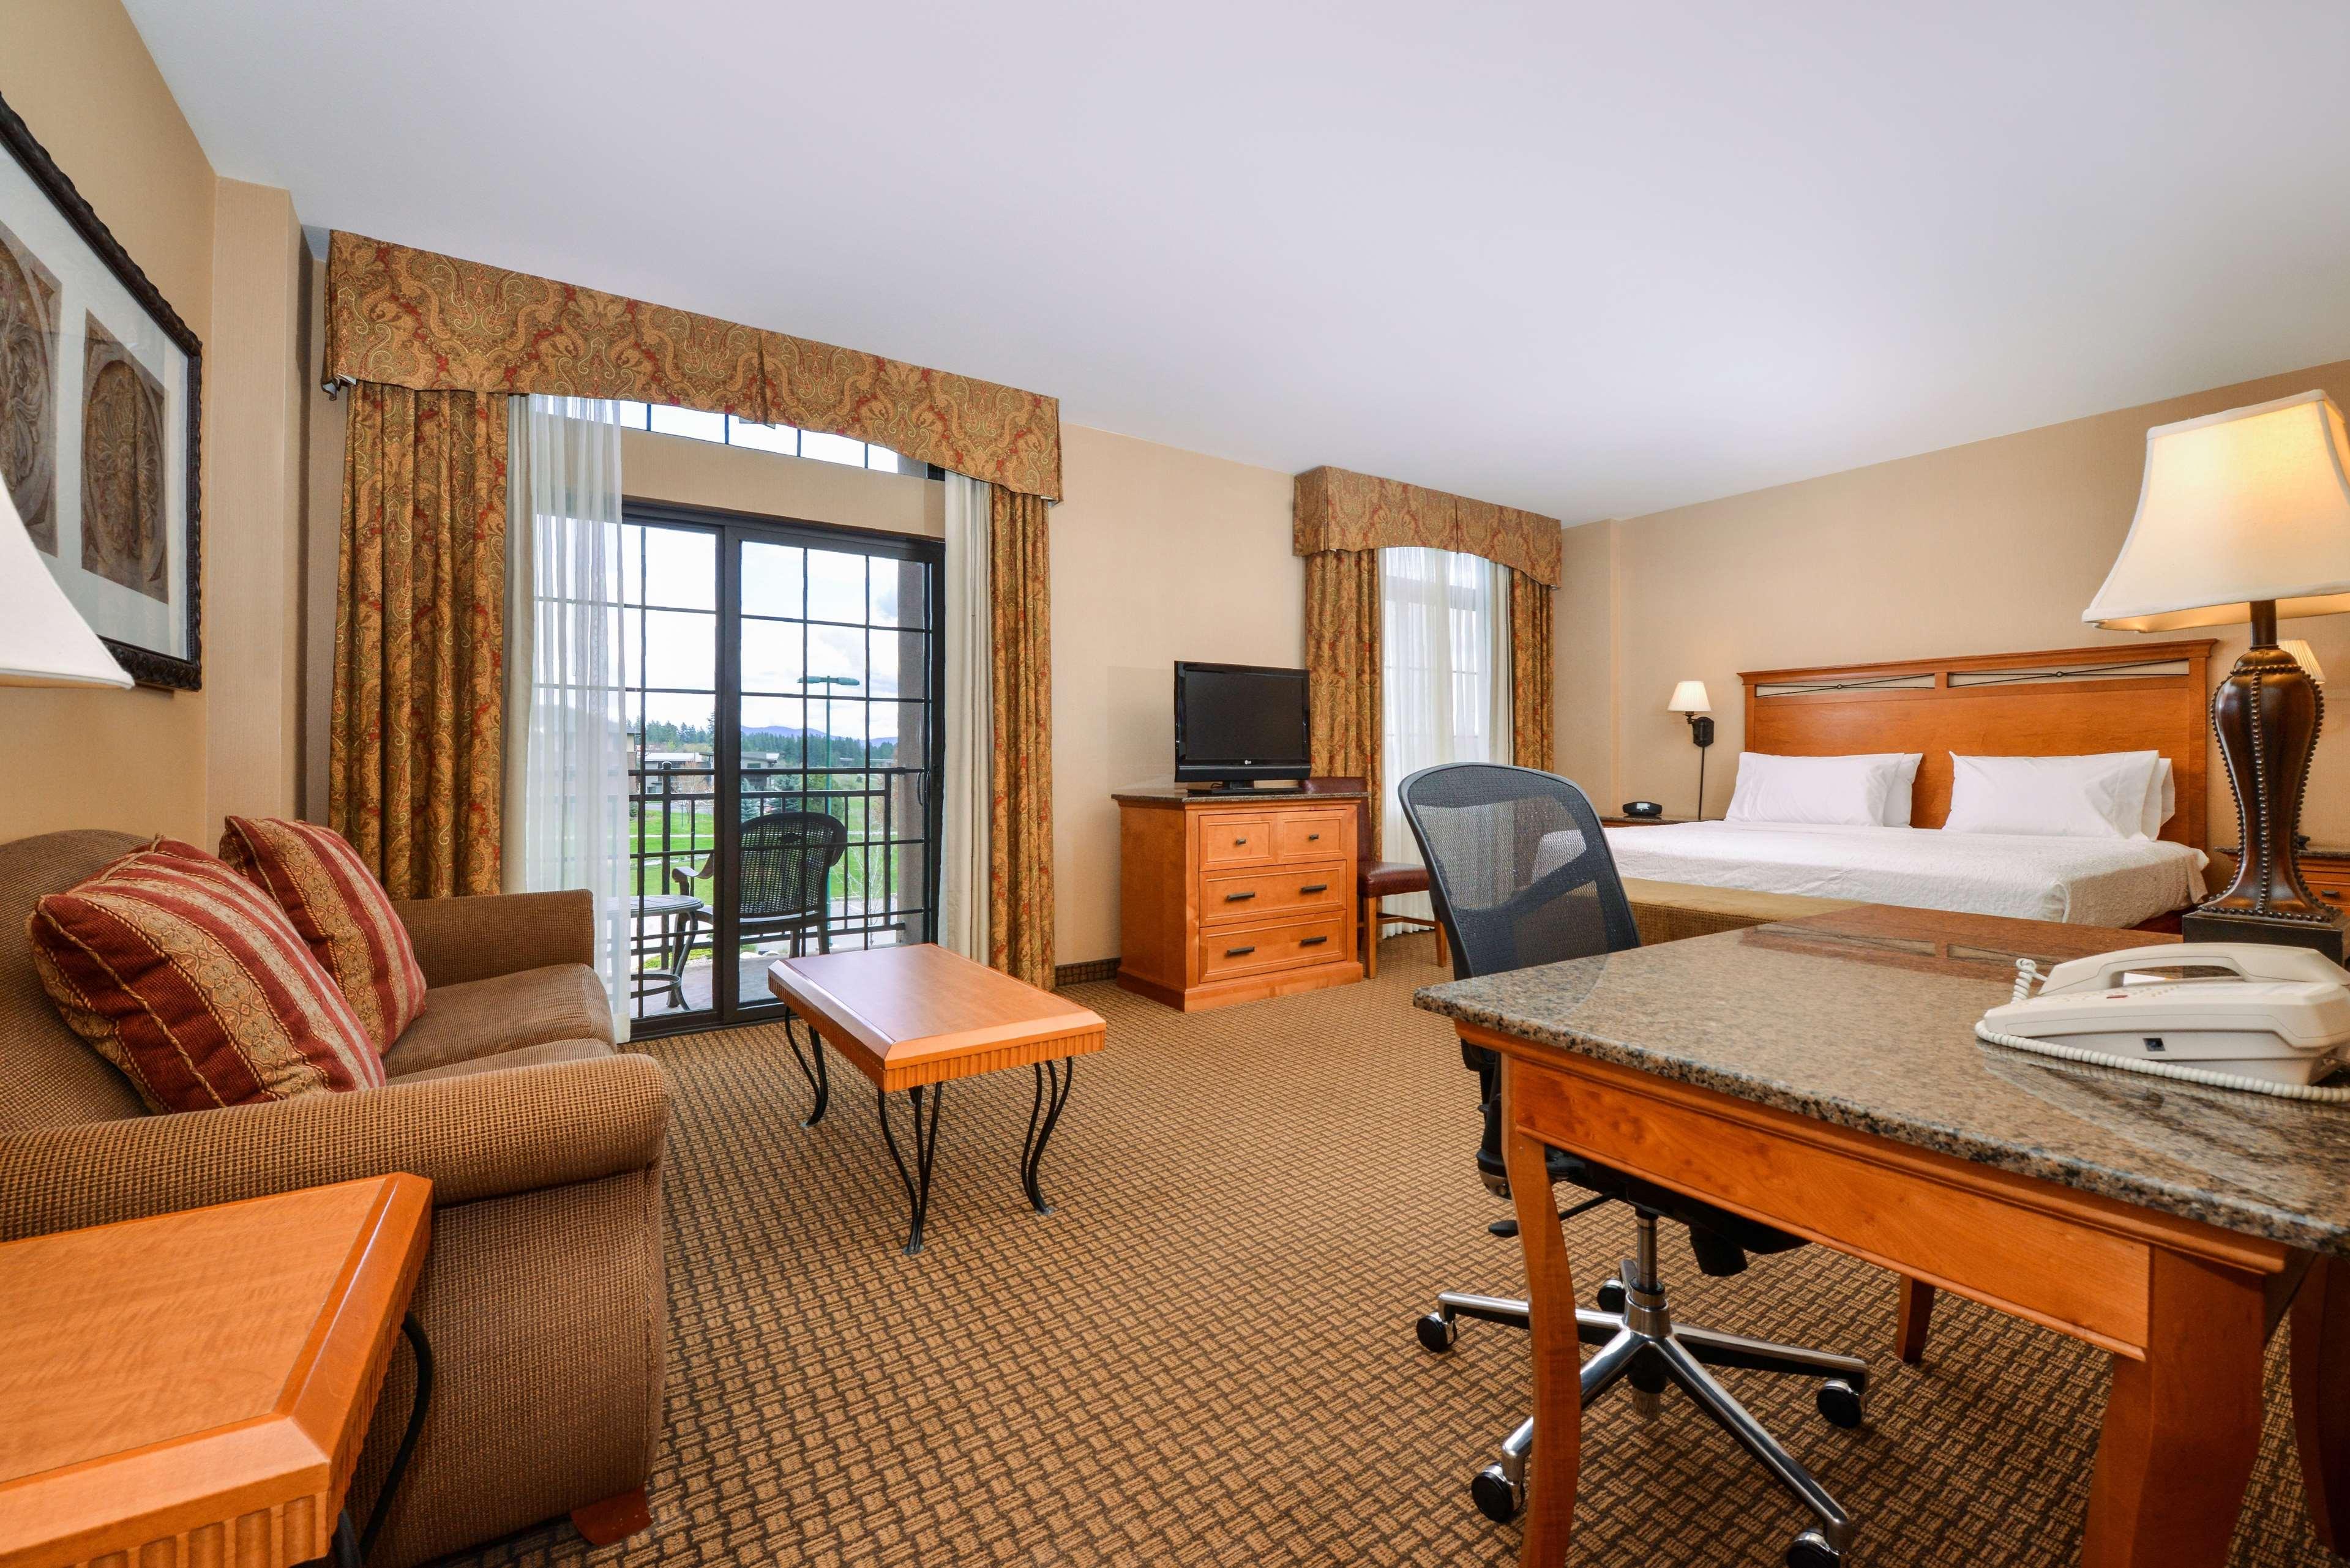 Hampton Inn & Suites Coeur d' Alene image 20